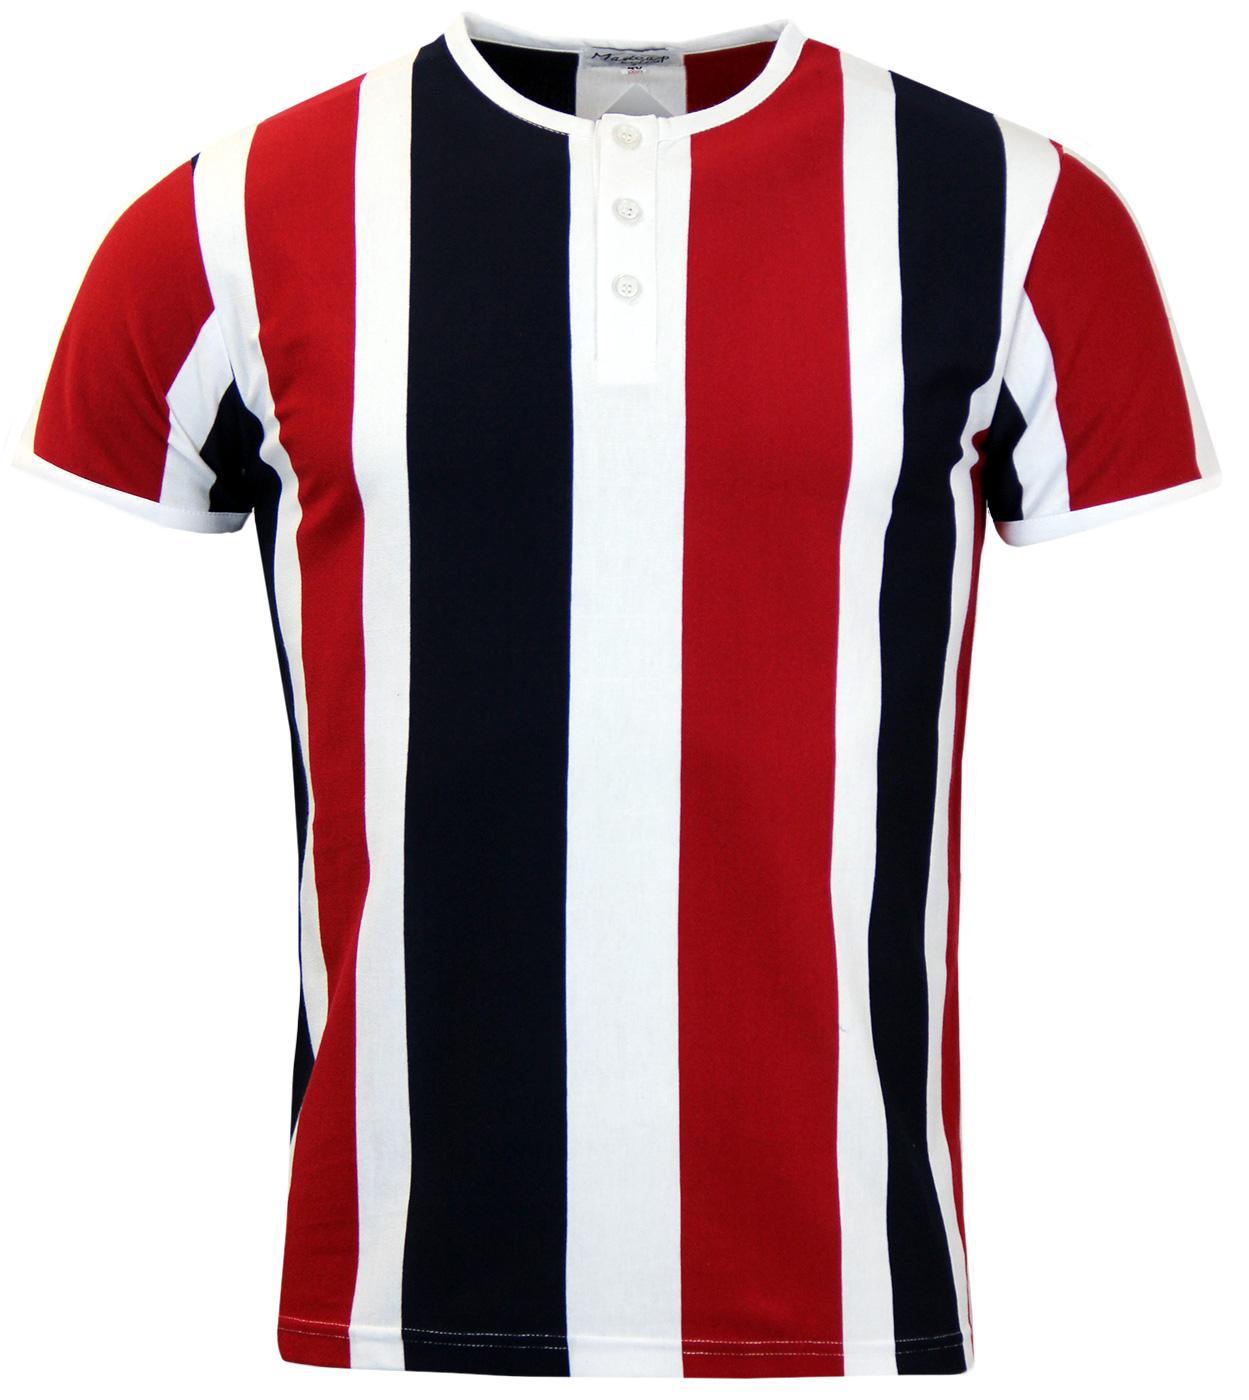 Winston S/S MADCAP ENGLAND Mod Stripe Grandad Top